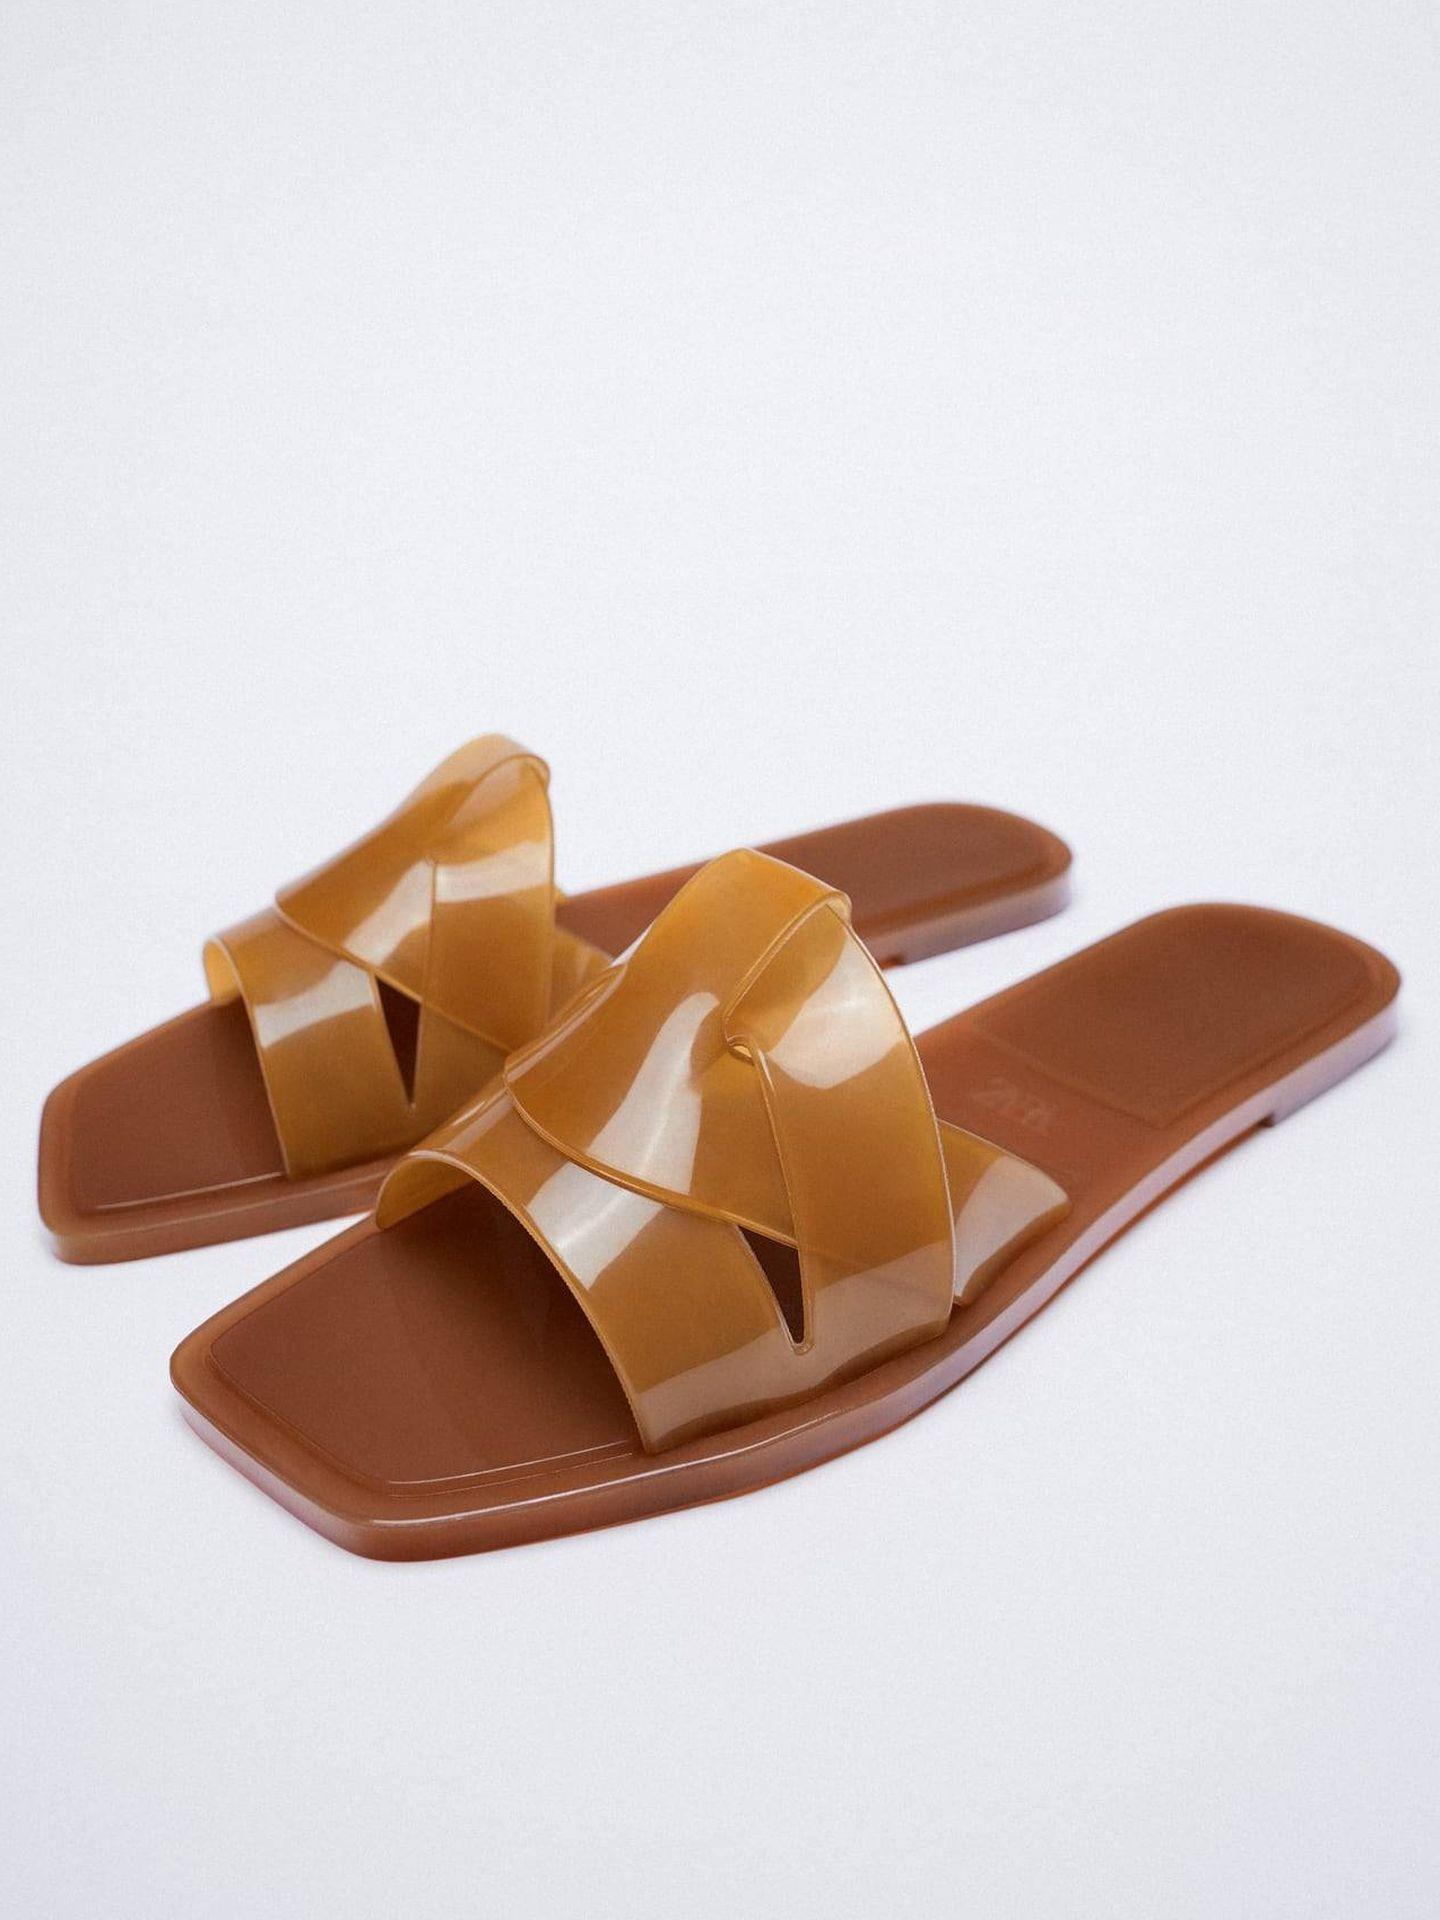 Sandalias engomadas de Zara. (Cortesía)